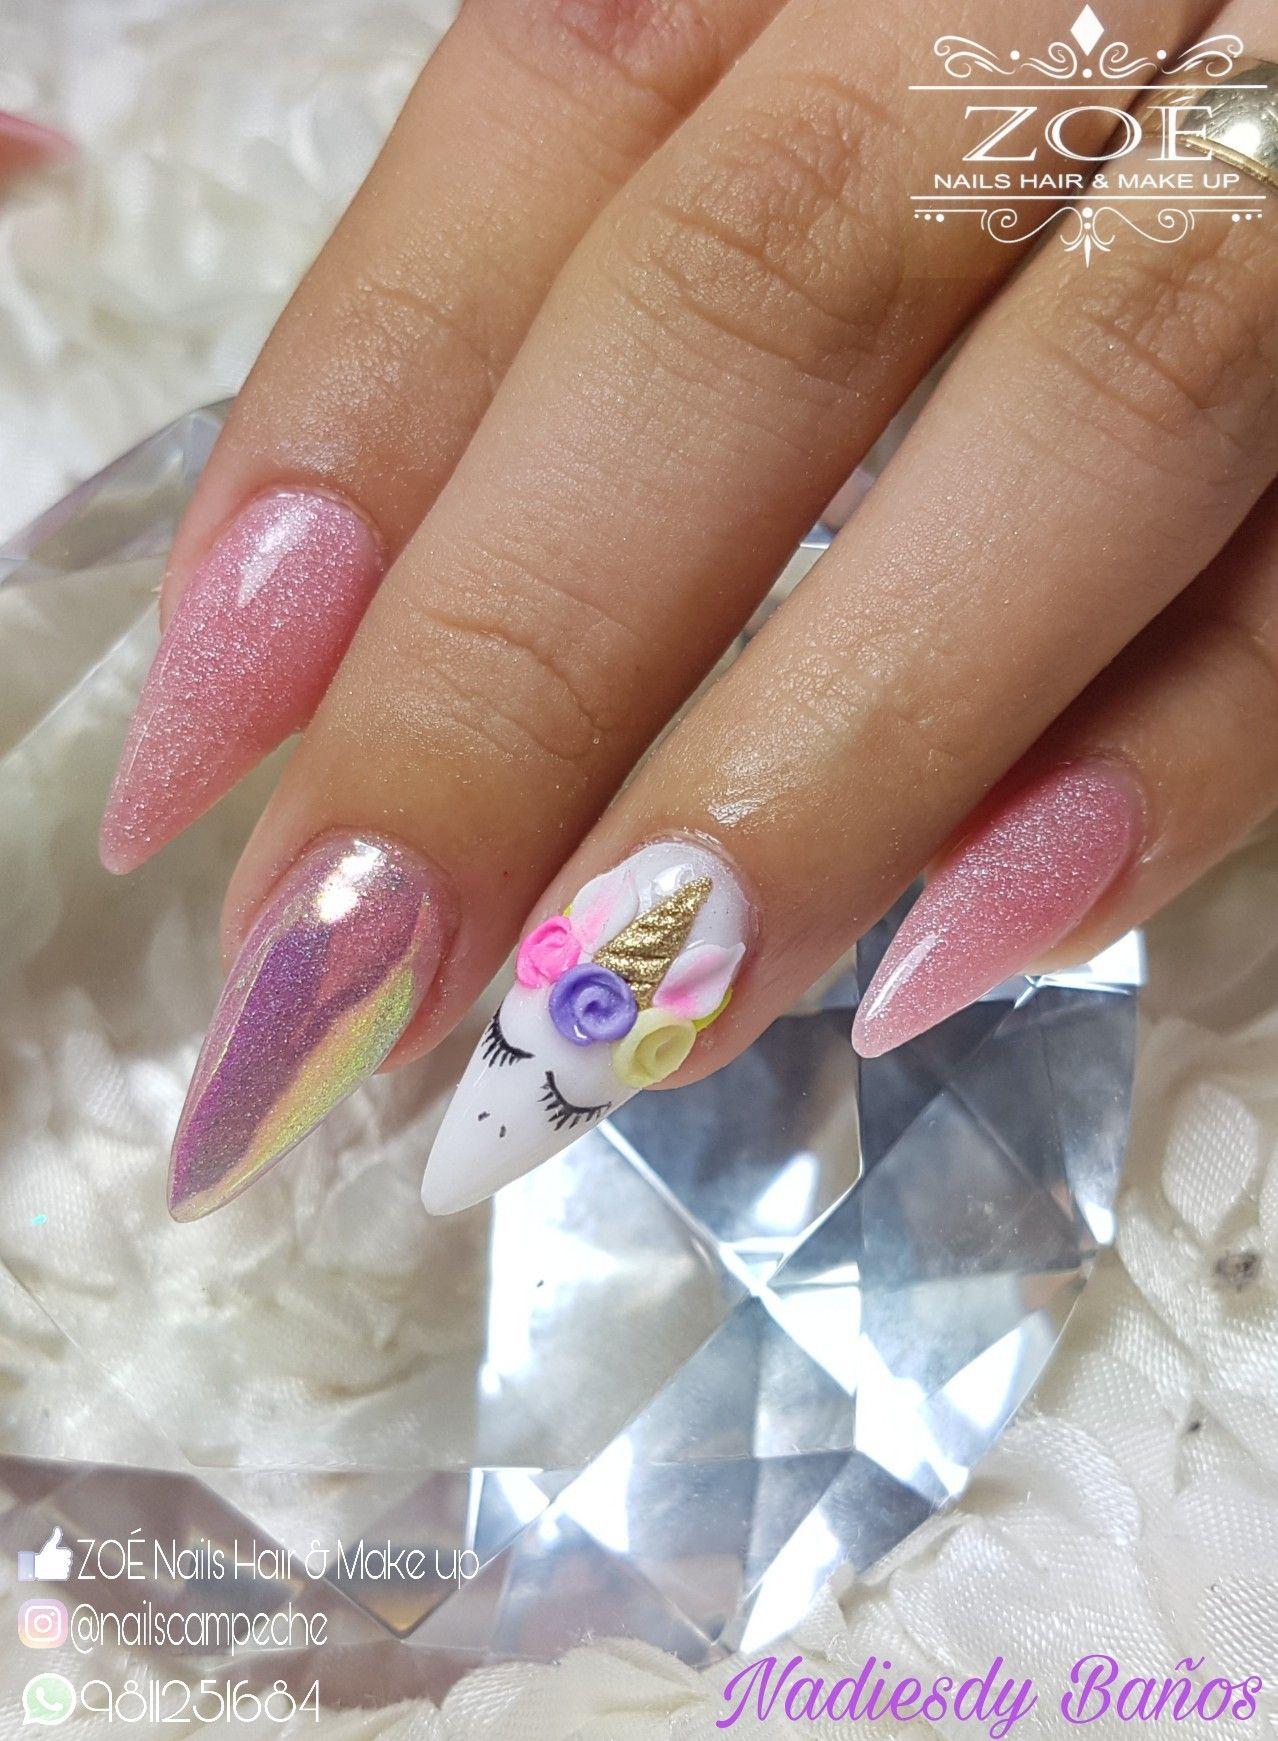 Unicorn nails hermosas pink - Easter Nails | Pinterest